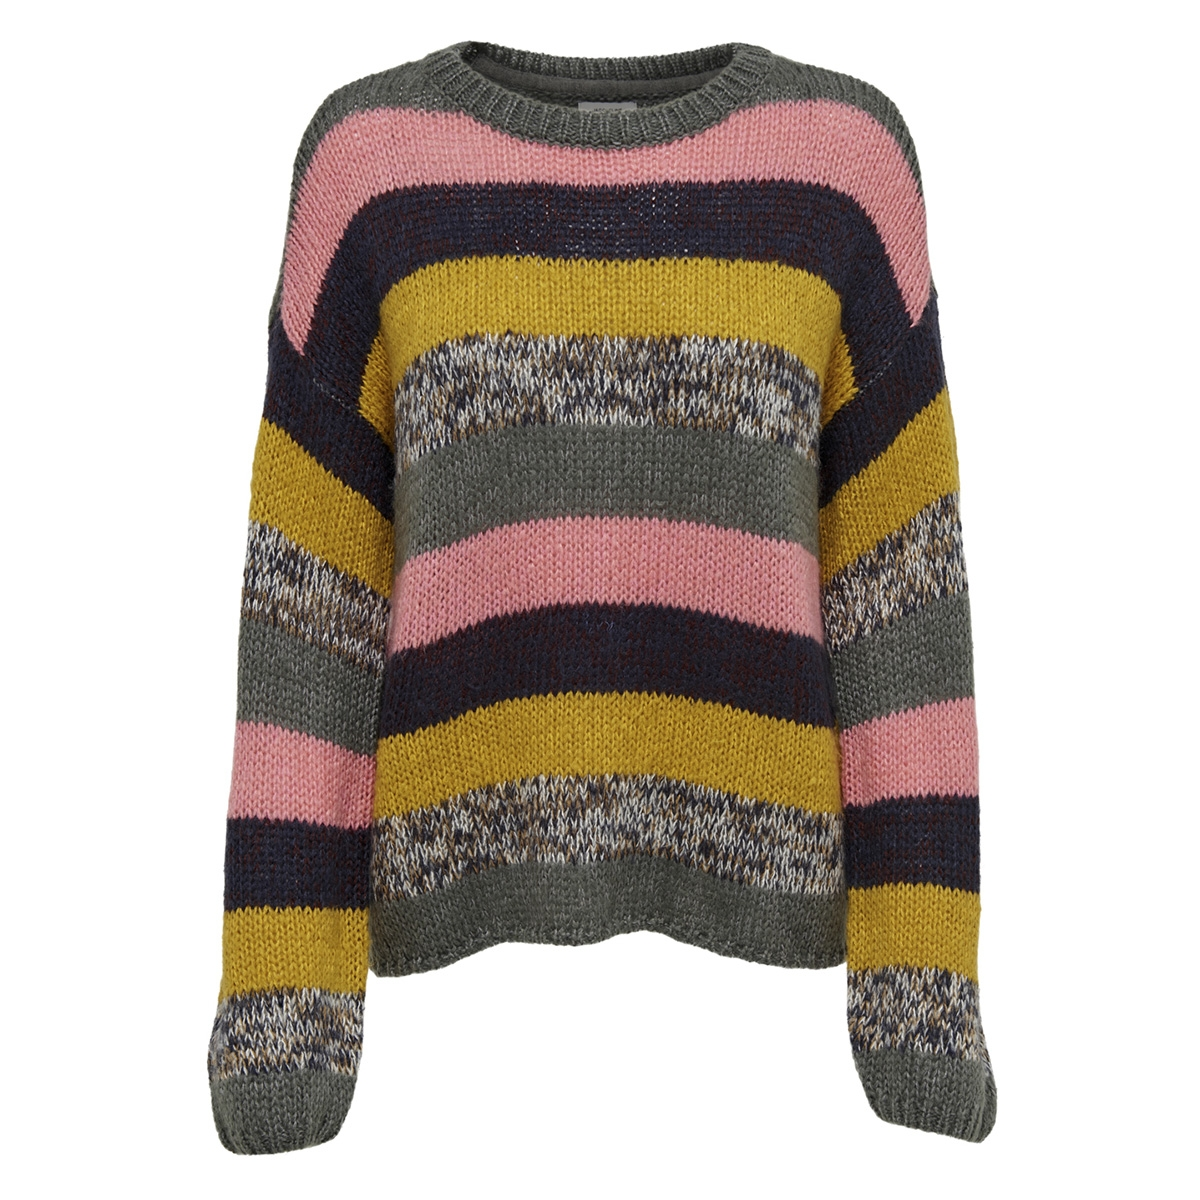 jdyiris l/s stripe pullover knt 15163049 jacqueline de yong trui chai tea/multi stri